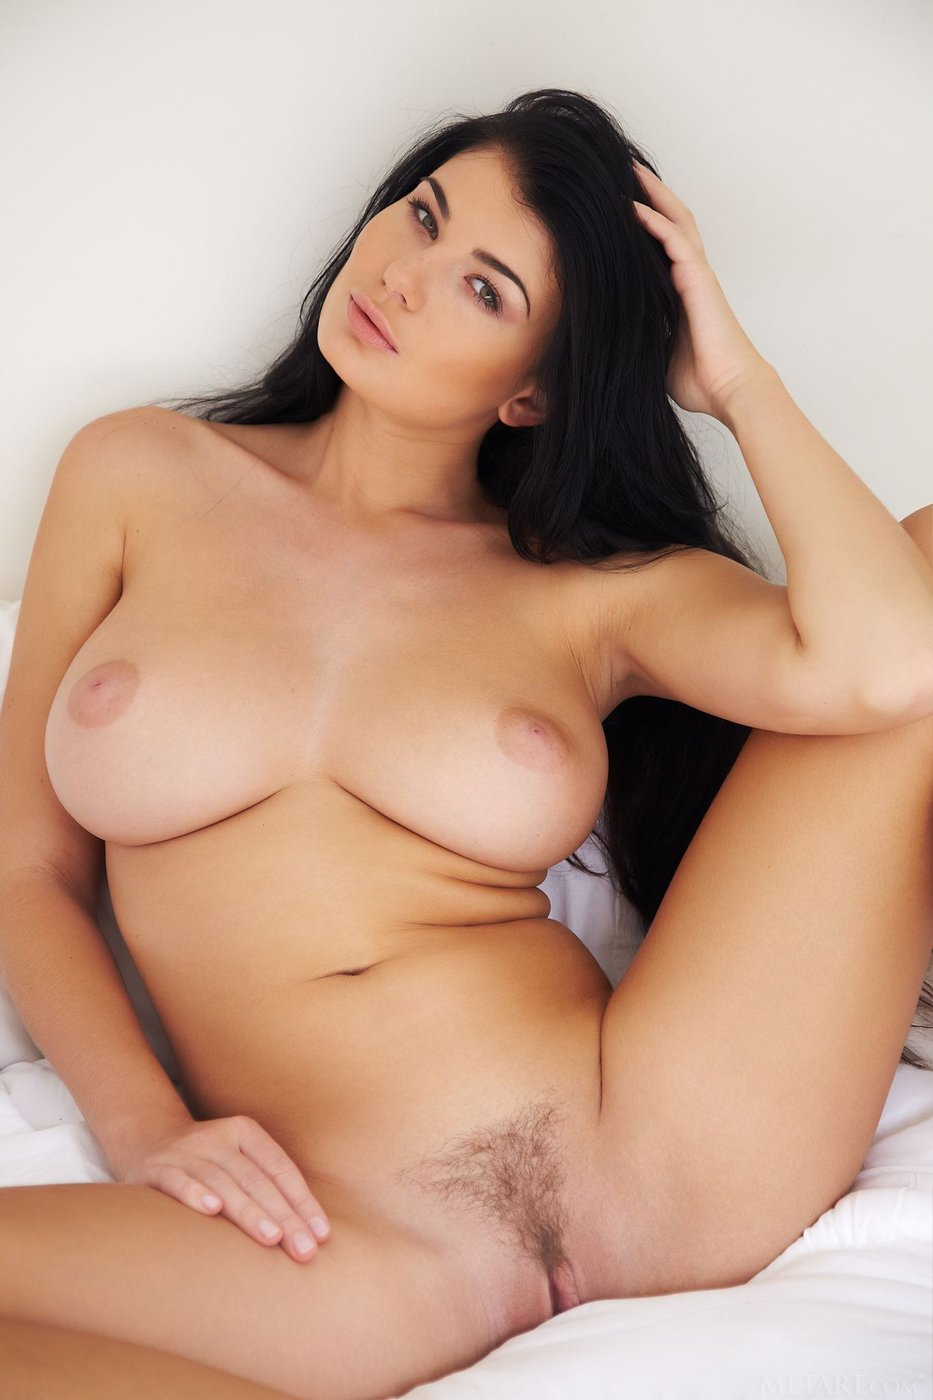 Naked daughter pics